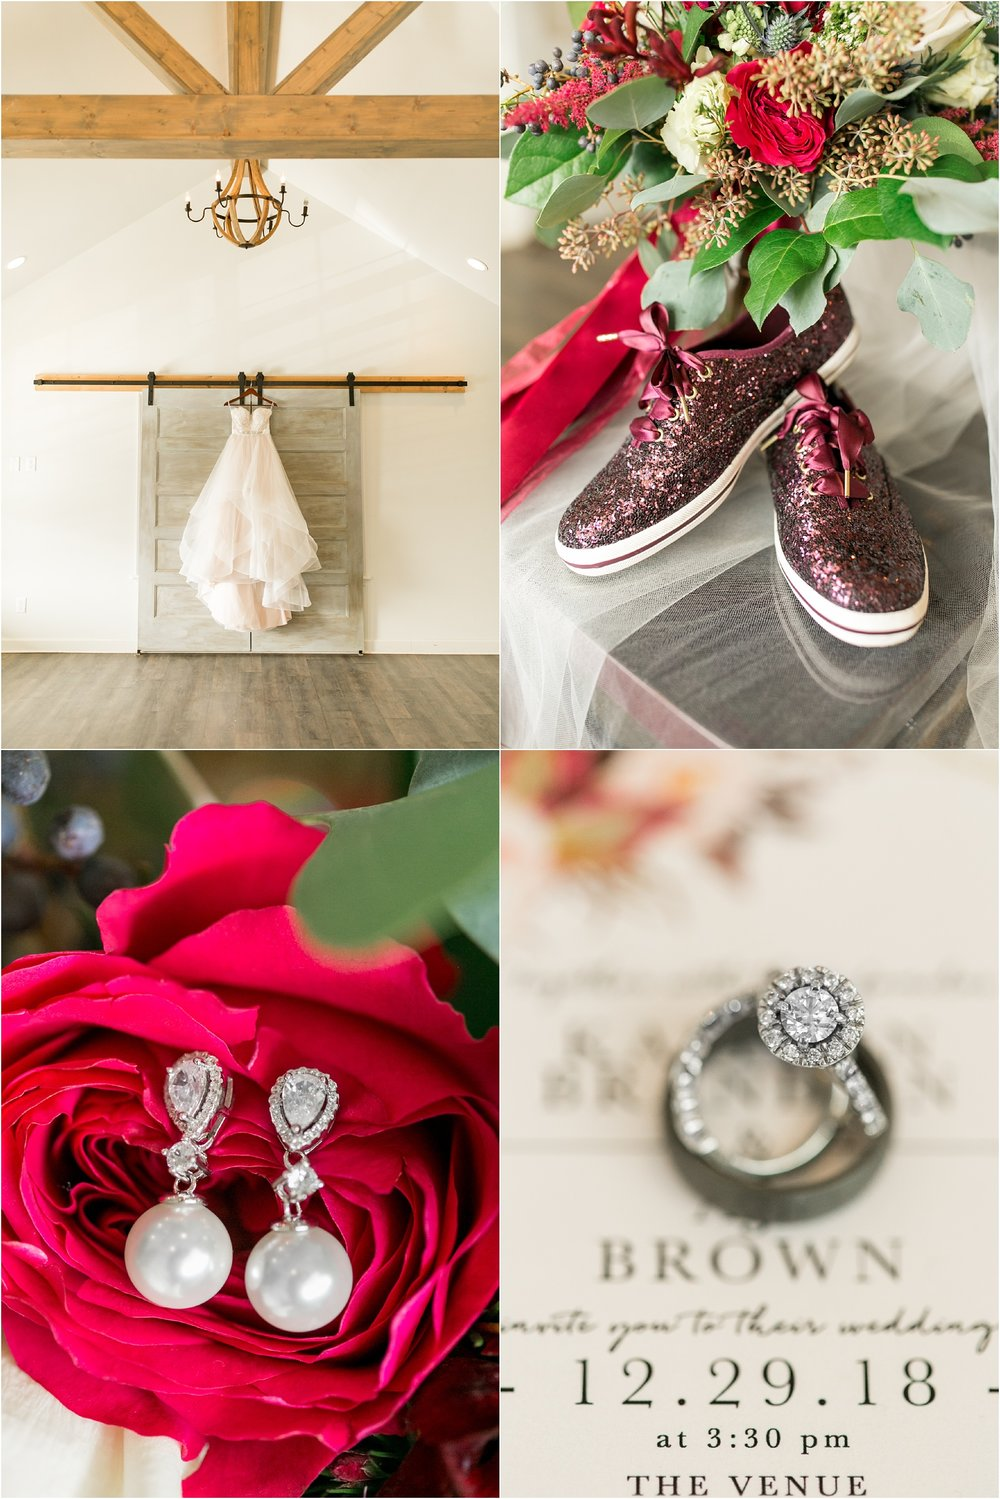 Savannah Eve Photography- Brandon-Brown Wedding-1.jpg